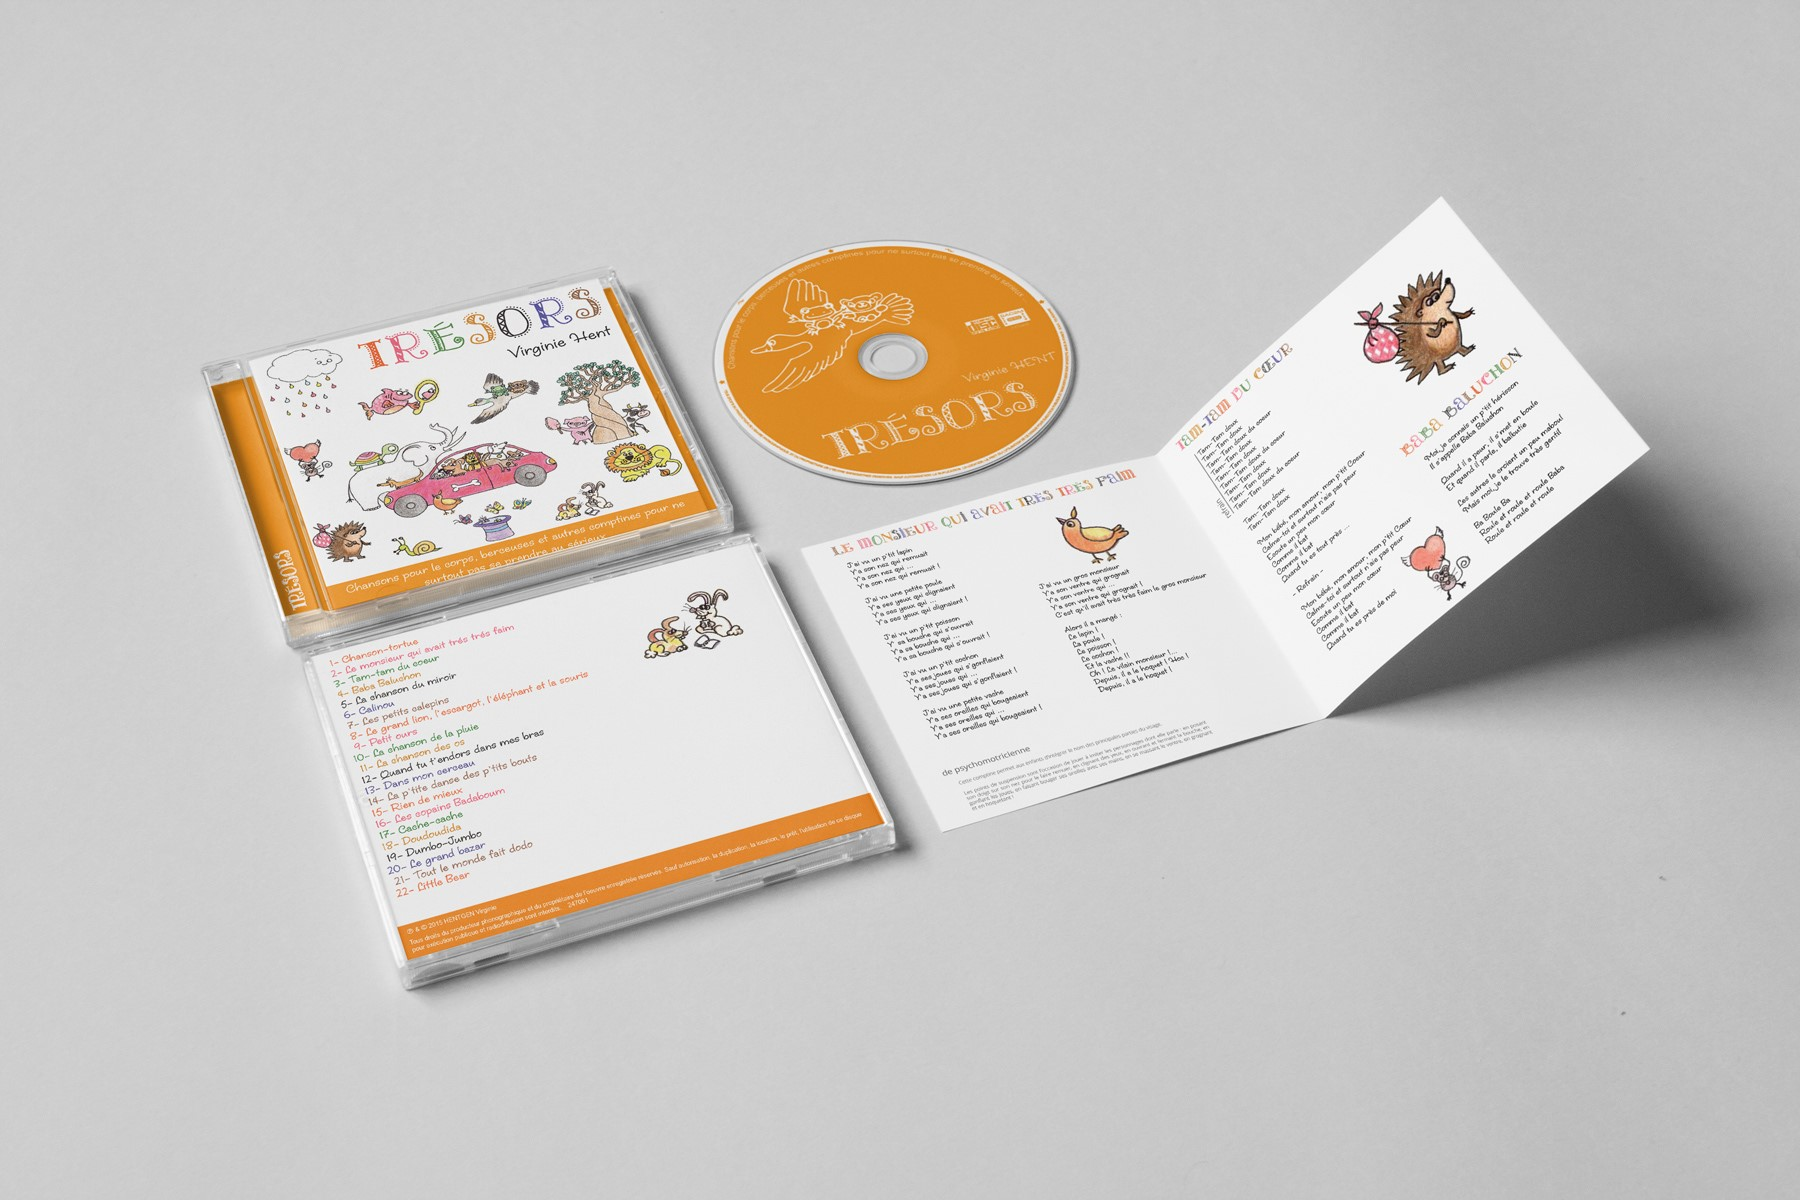 AlbumTresors-CD